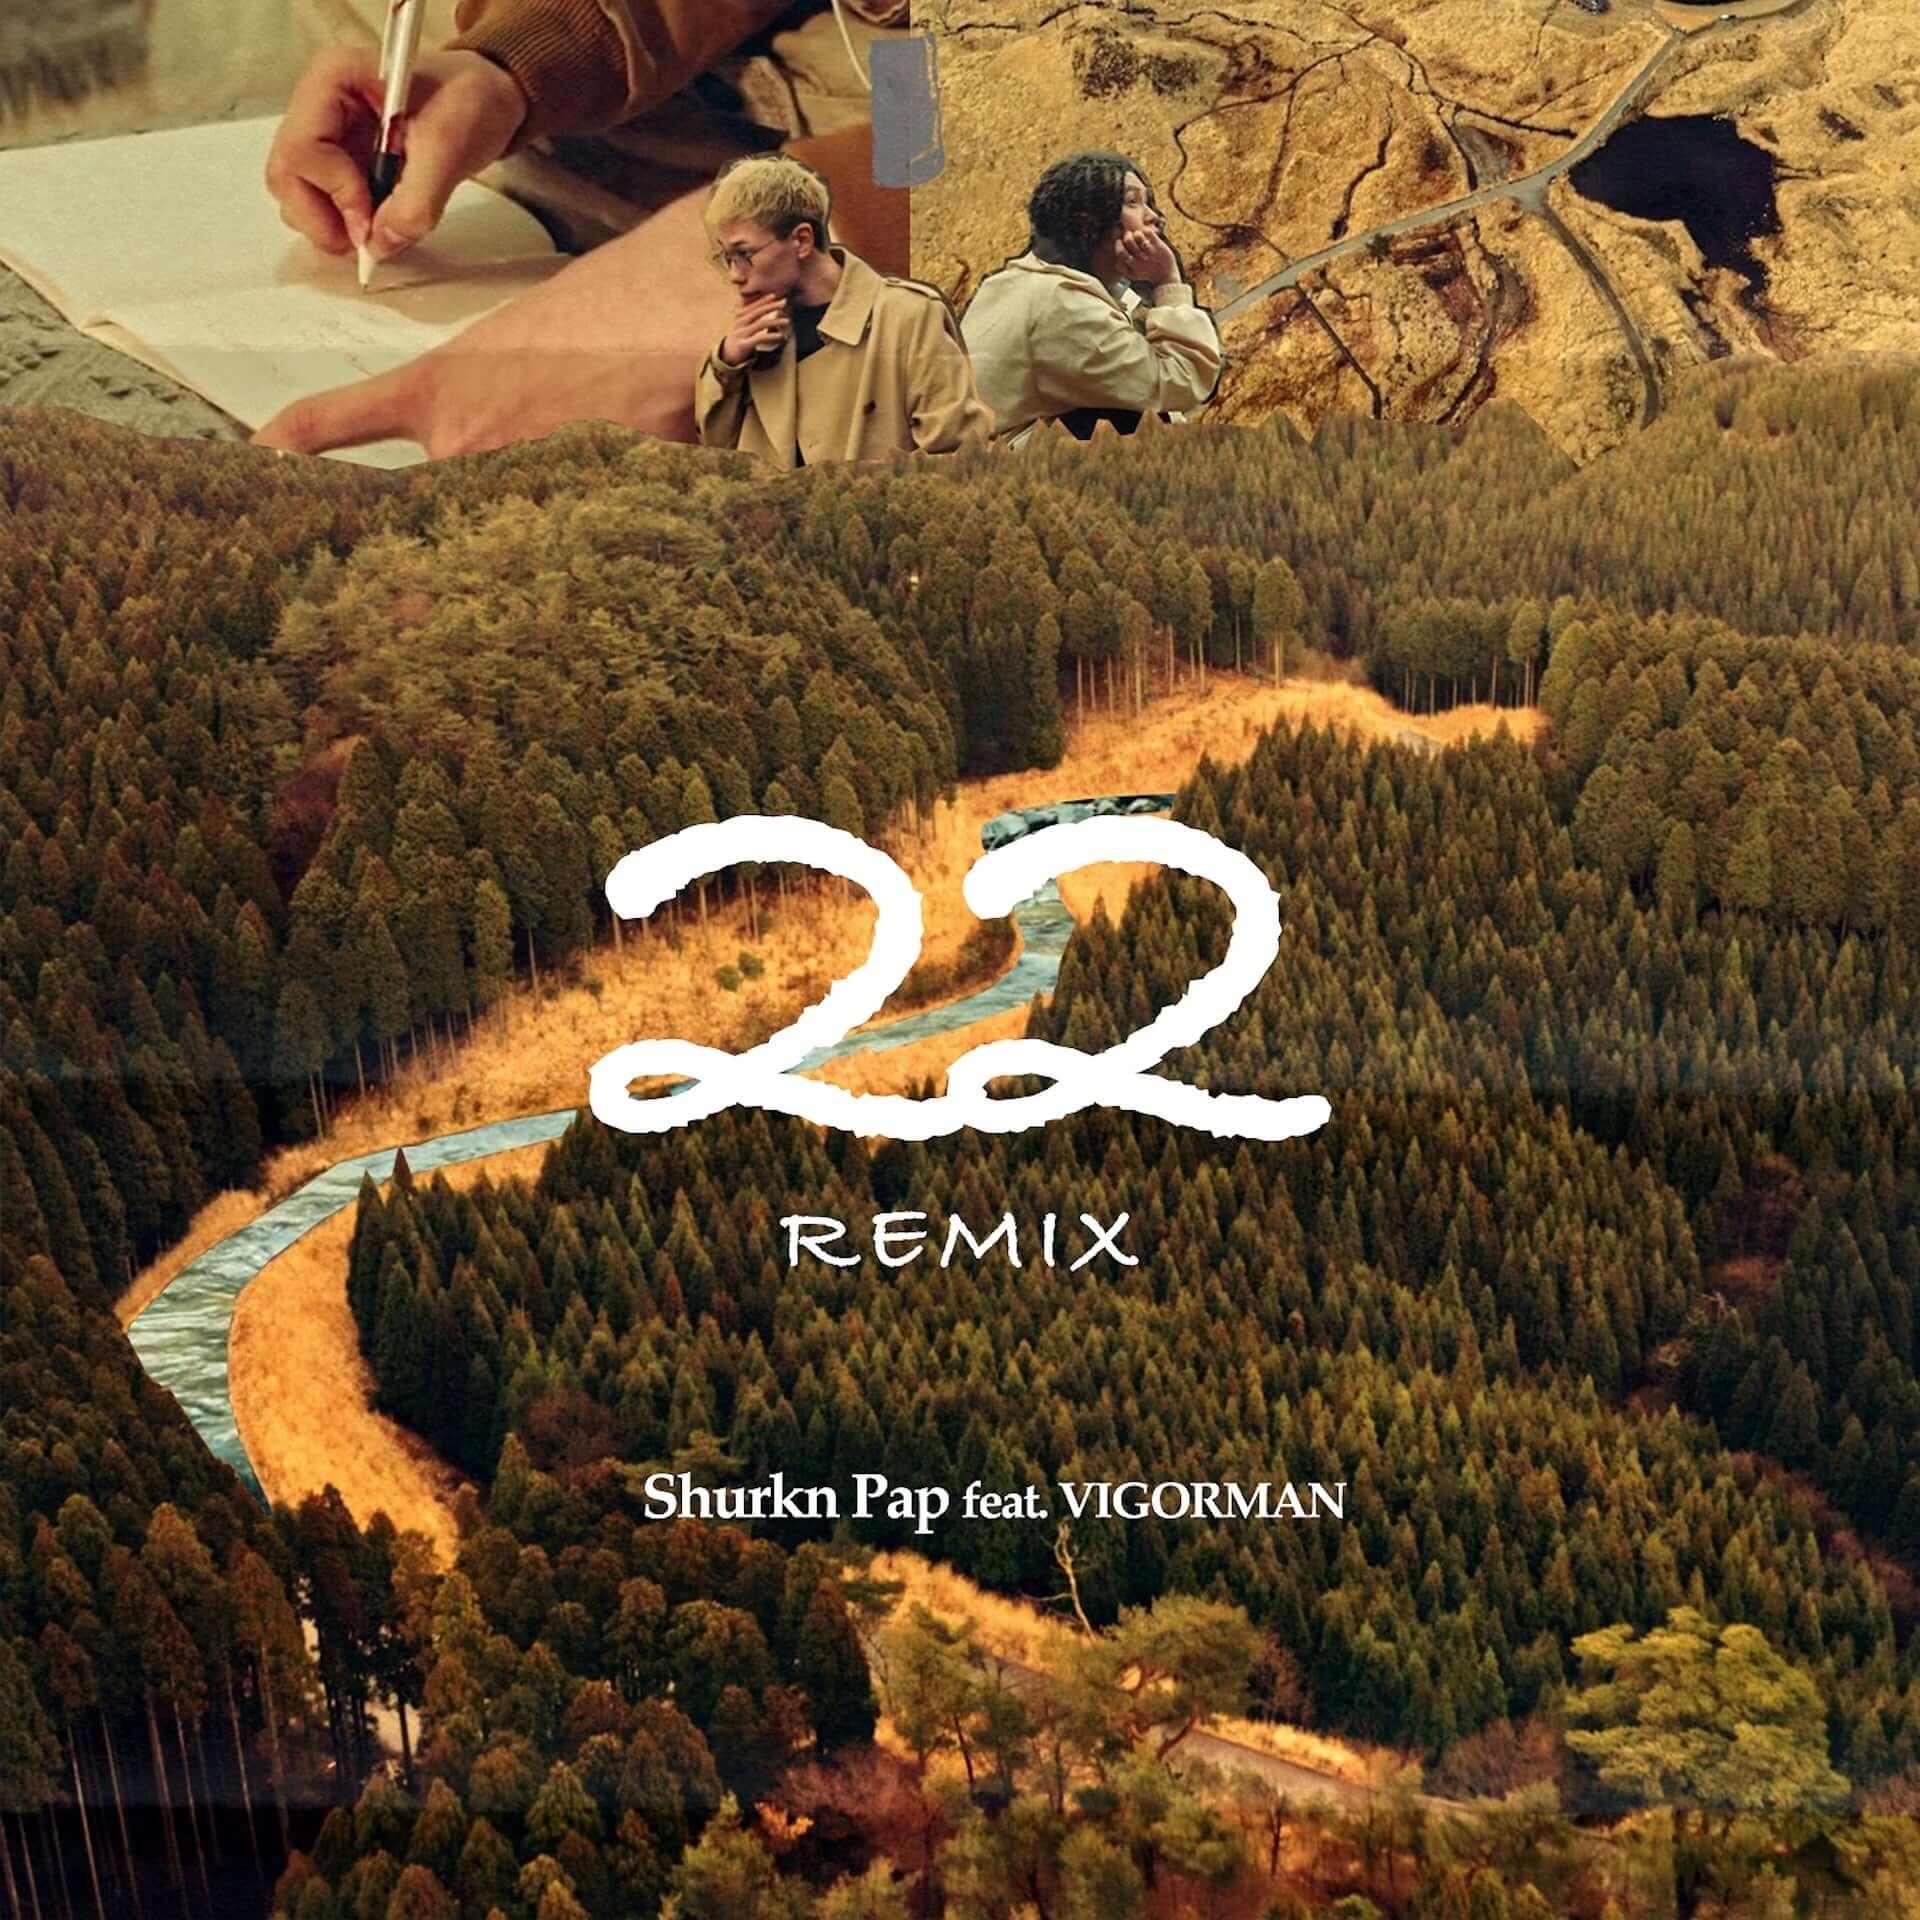 "Shurkn Papの人気曲に変態紳士クラブ・VIGORMANが参加した""22 Remix""が配信開始|MVのティーザーも公開 music200522_shurknpap_22remix_2-1920x1920"